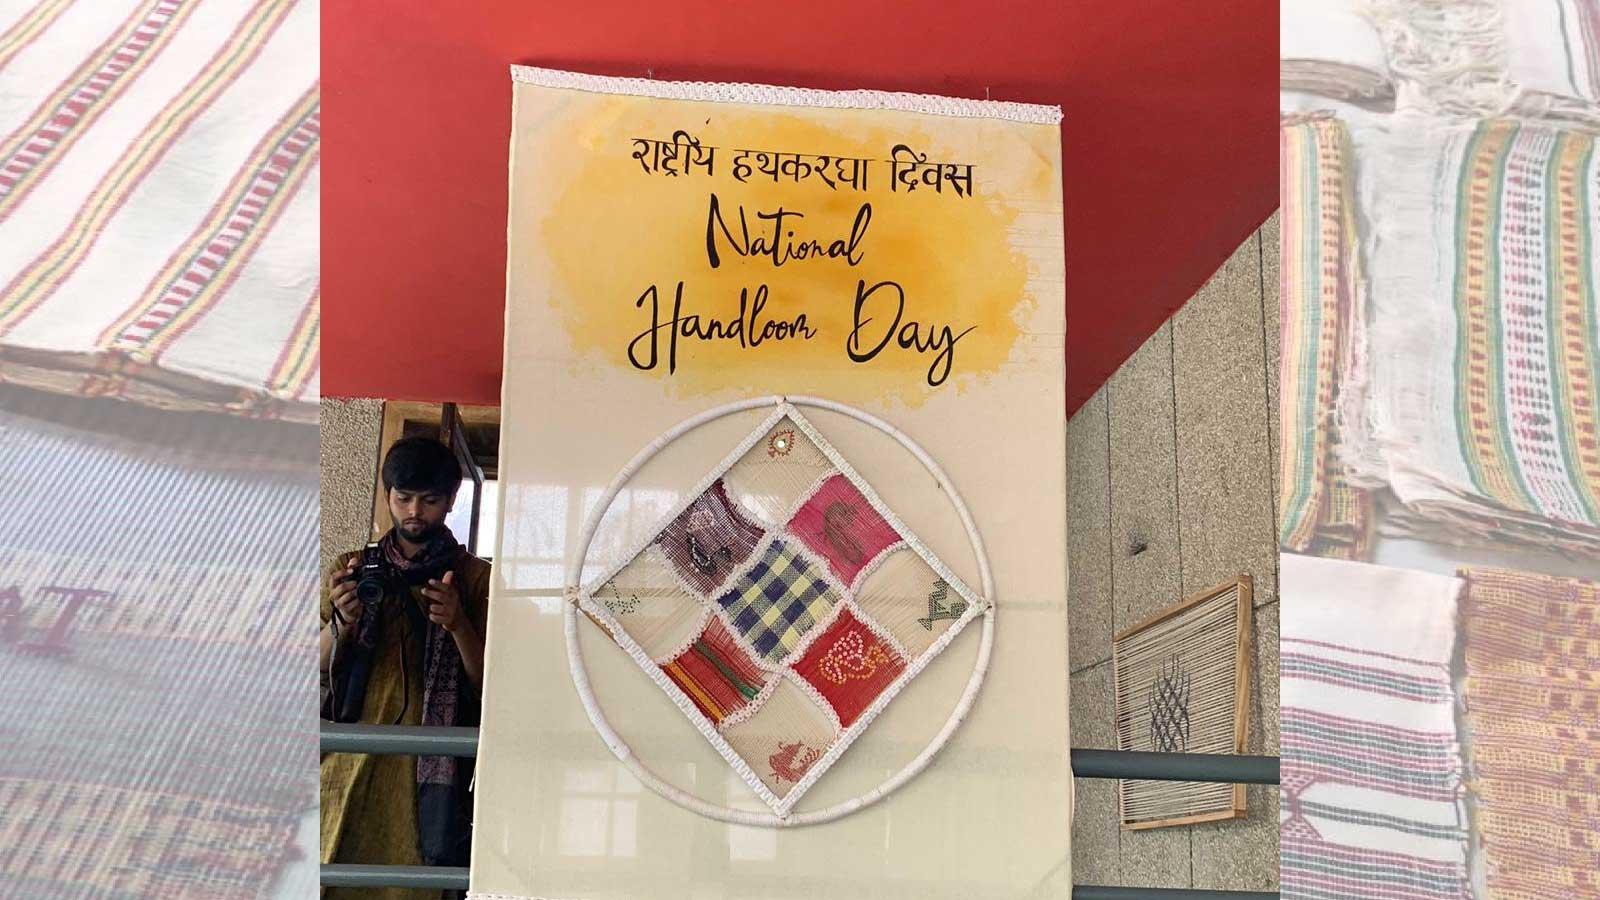 National Handloom Day Exhibition Image